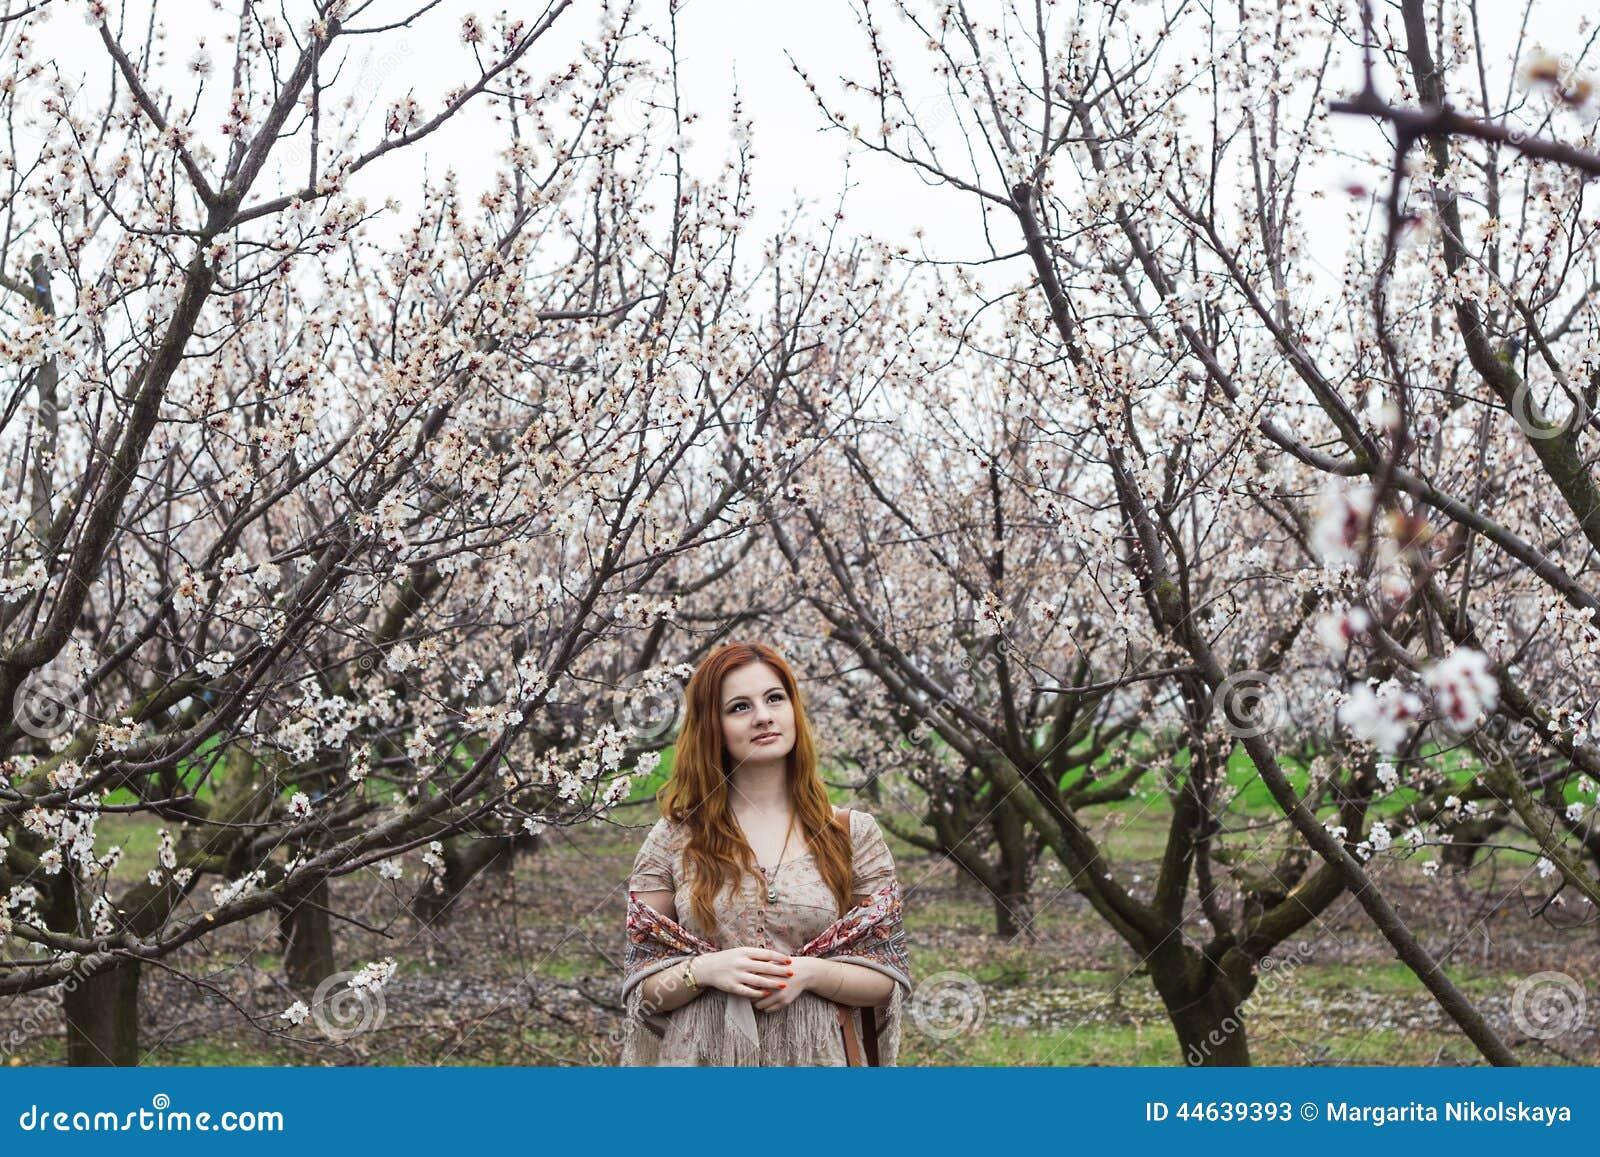 Girl in blooming gardens